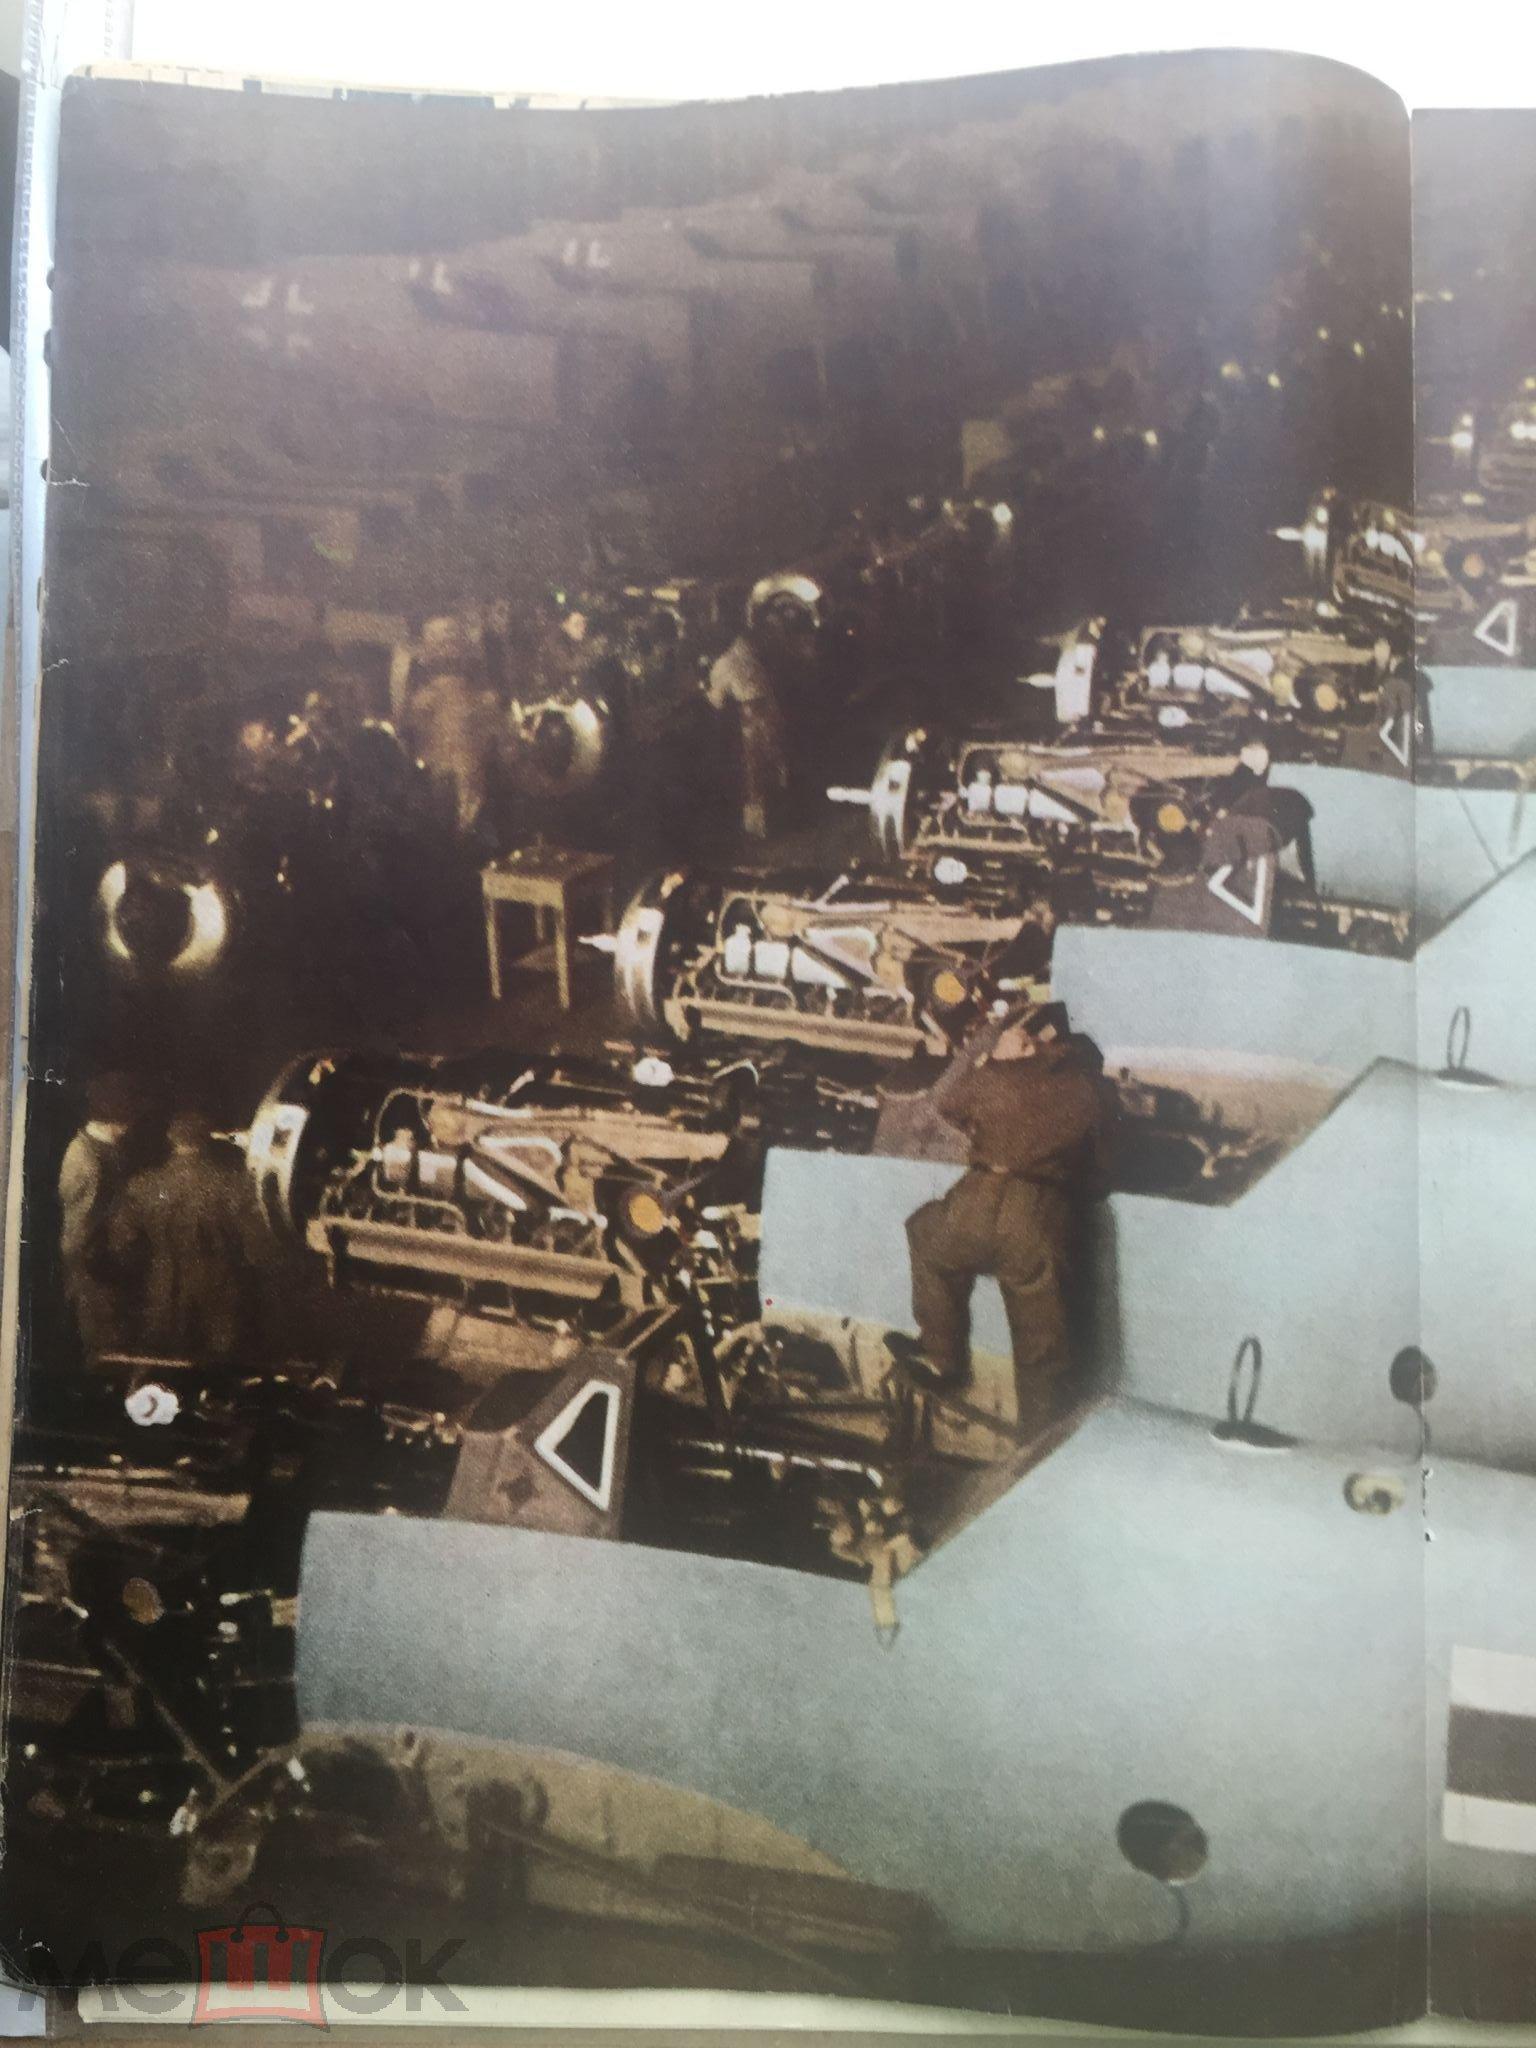 Сигнал номер 3 1944 (итал) Теодорини Корнелиу,  Kptw. IX-X танки и прочие вундервафли WWII